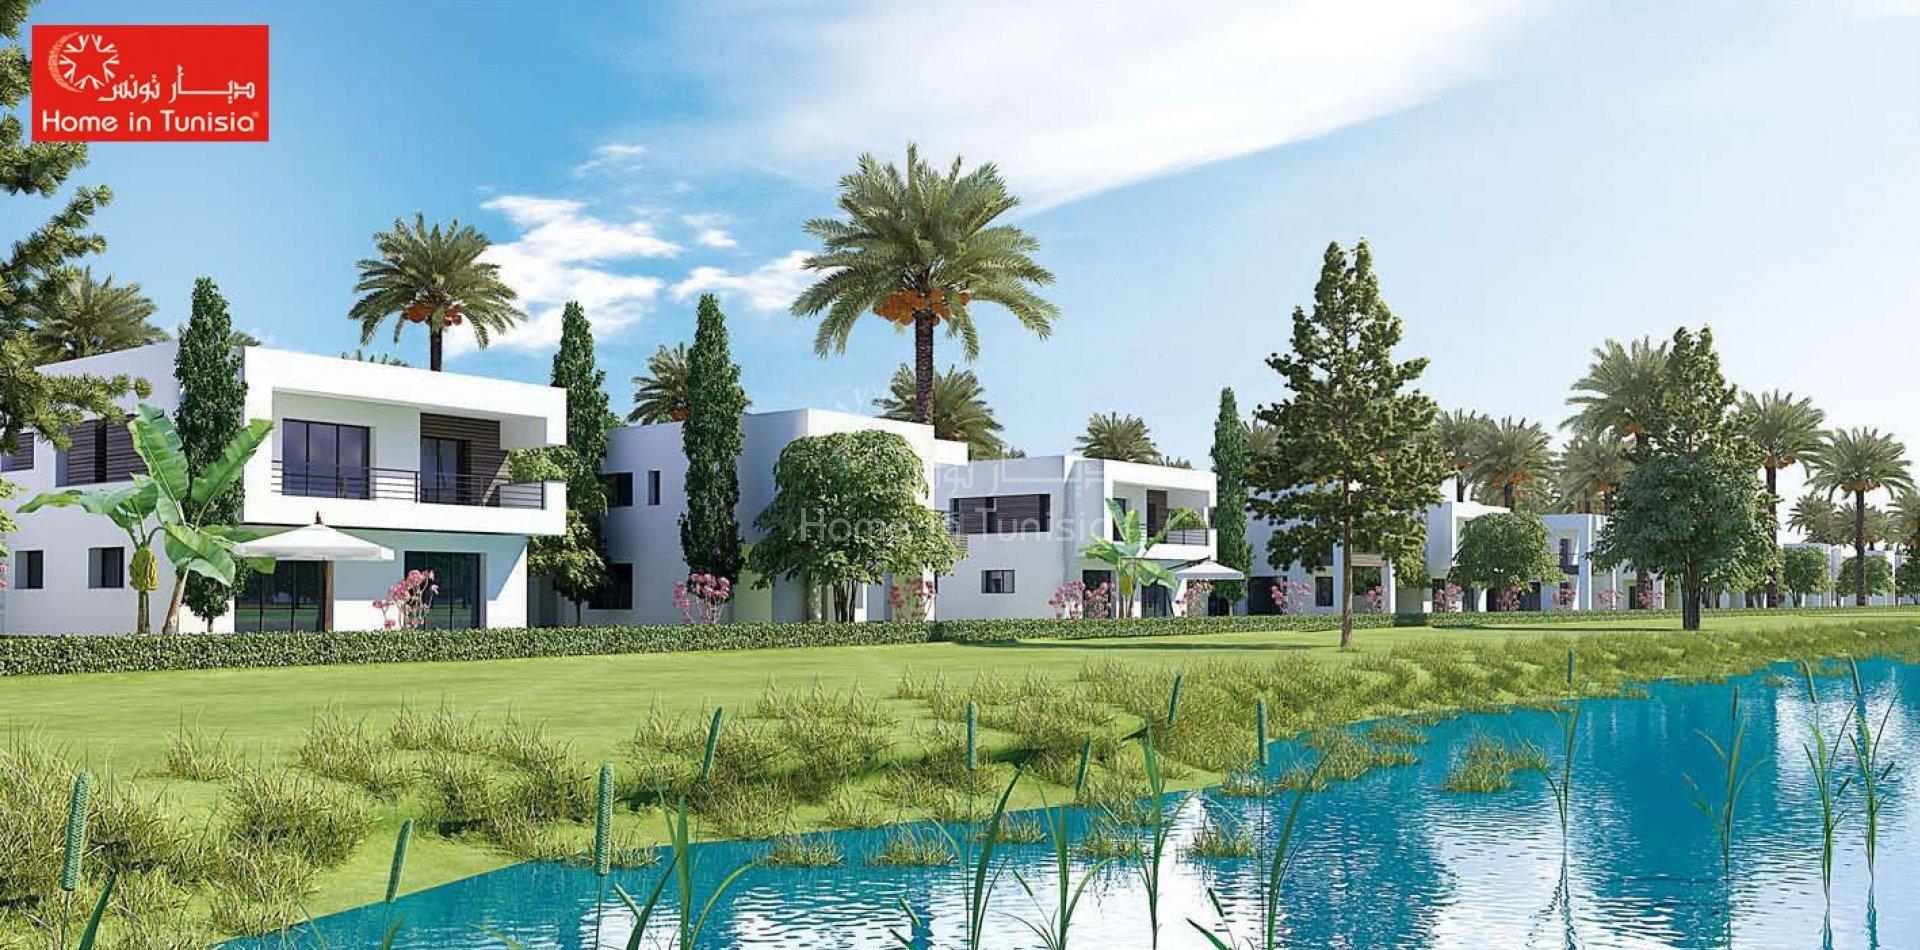 Villa golf jumelée neuve de 323.06 m2 avec 4 chambres terrasse jardin piscine